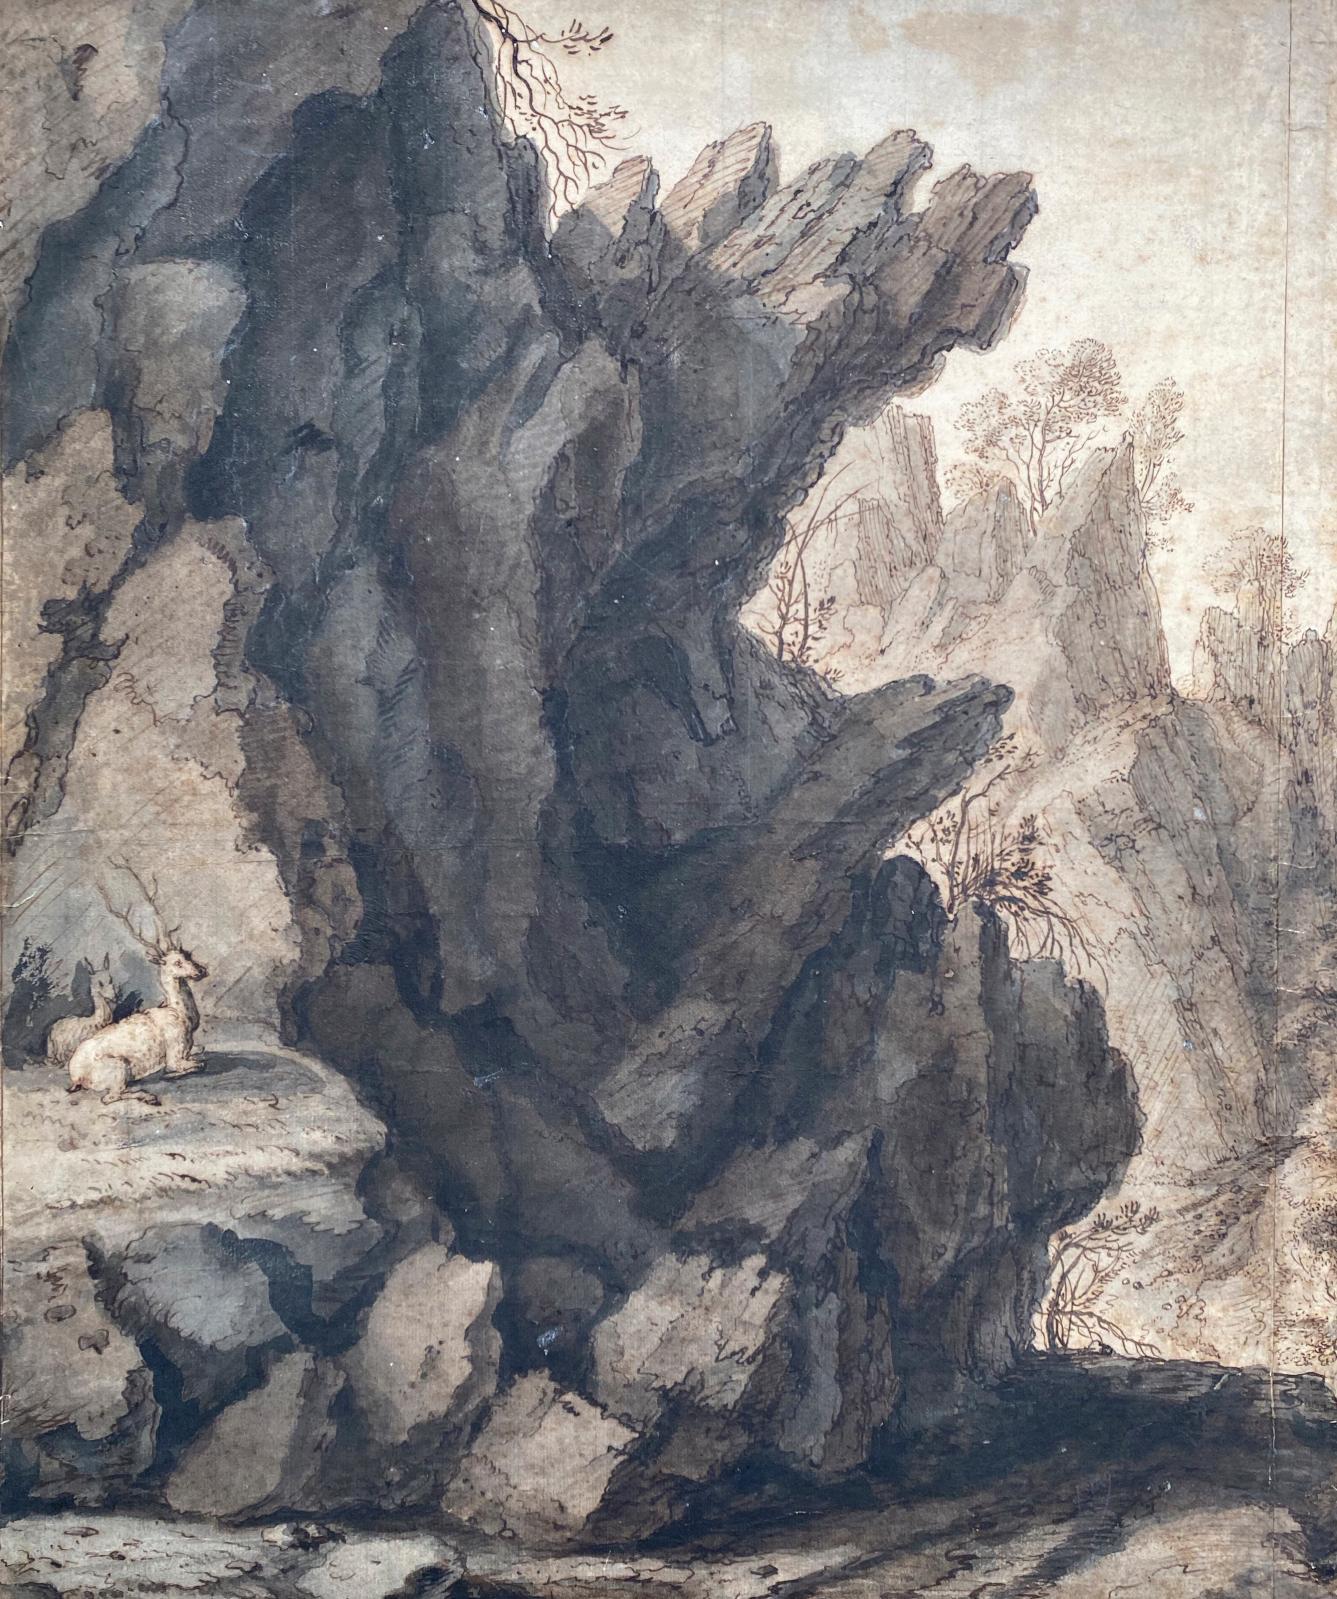 Lambert Doomer (1624–1700), Mountain Landscape, pen and brown ink, grey and brown wash, 44 x 37 cm/17.32 x 14.56 in. Galerie Benjamin Pero